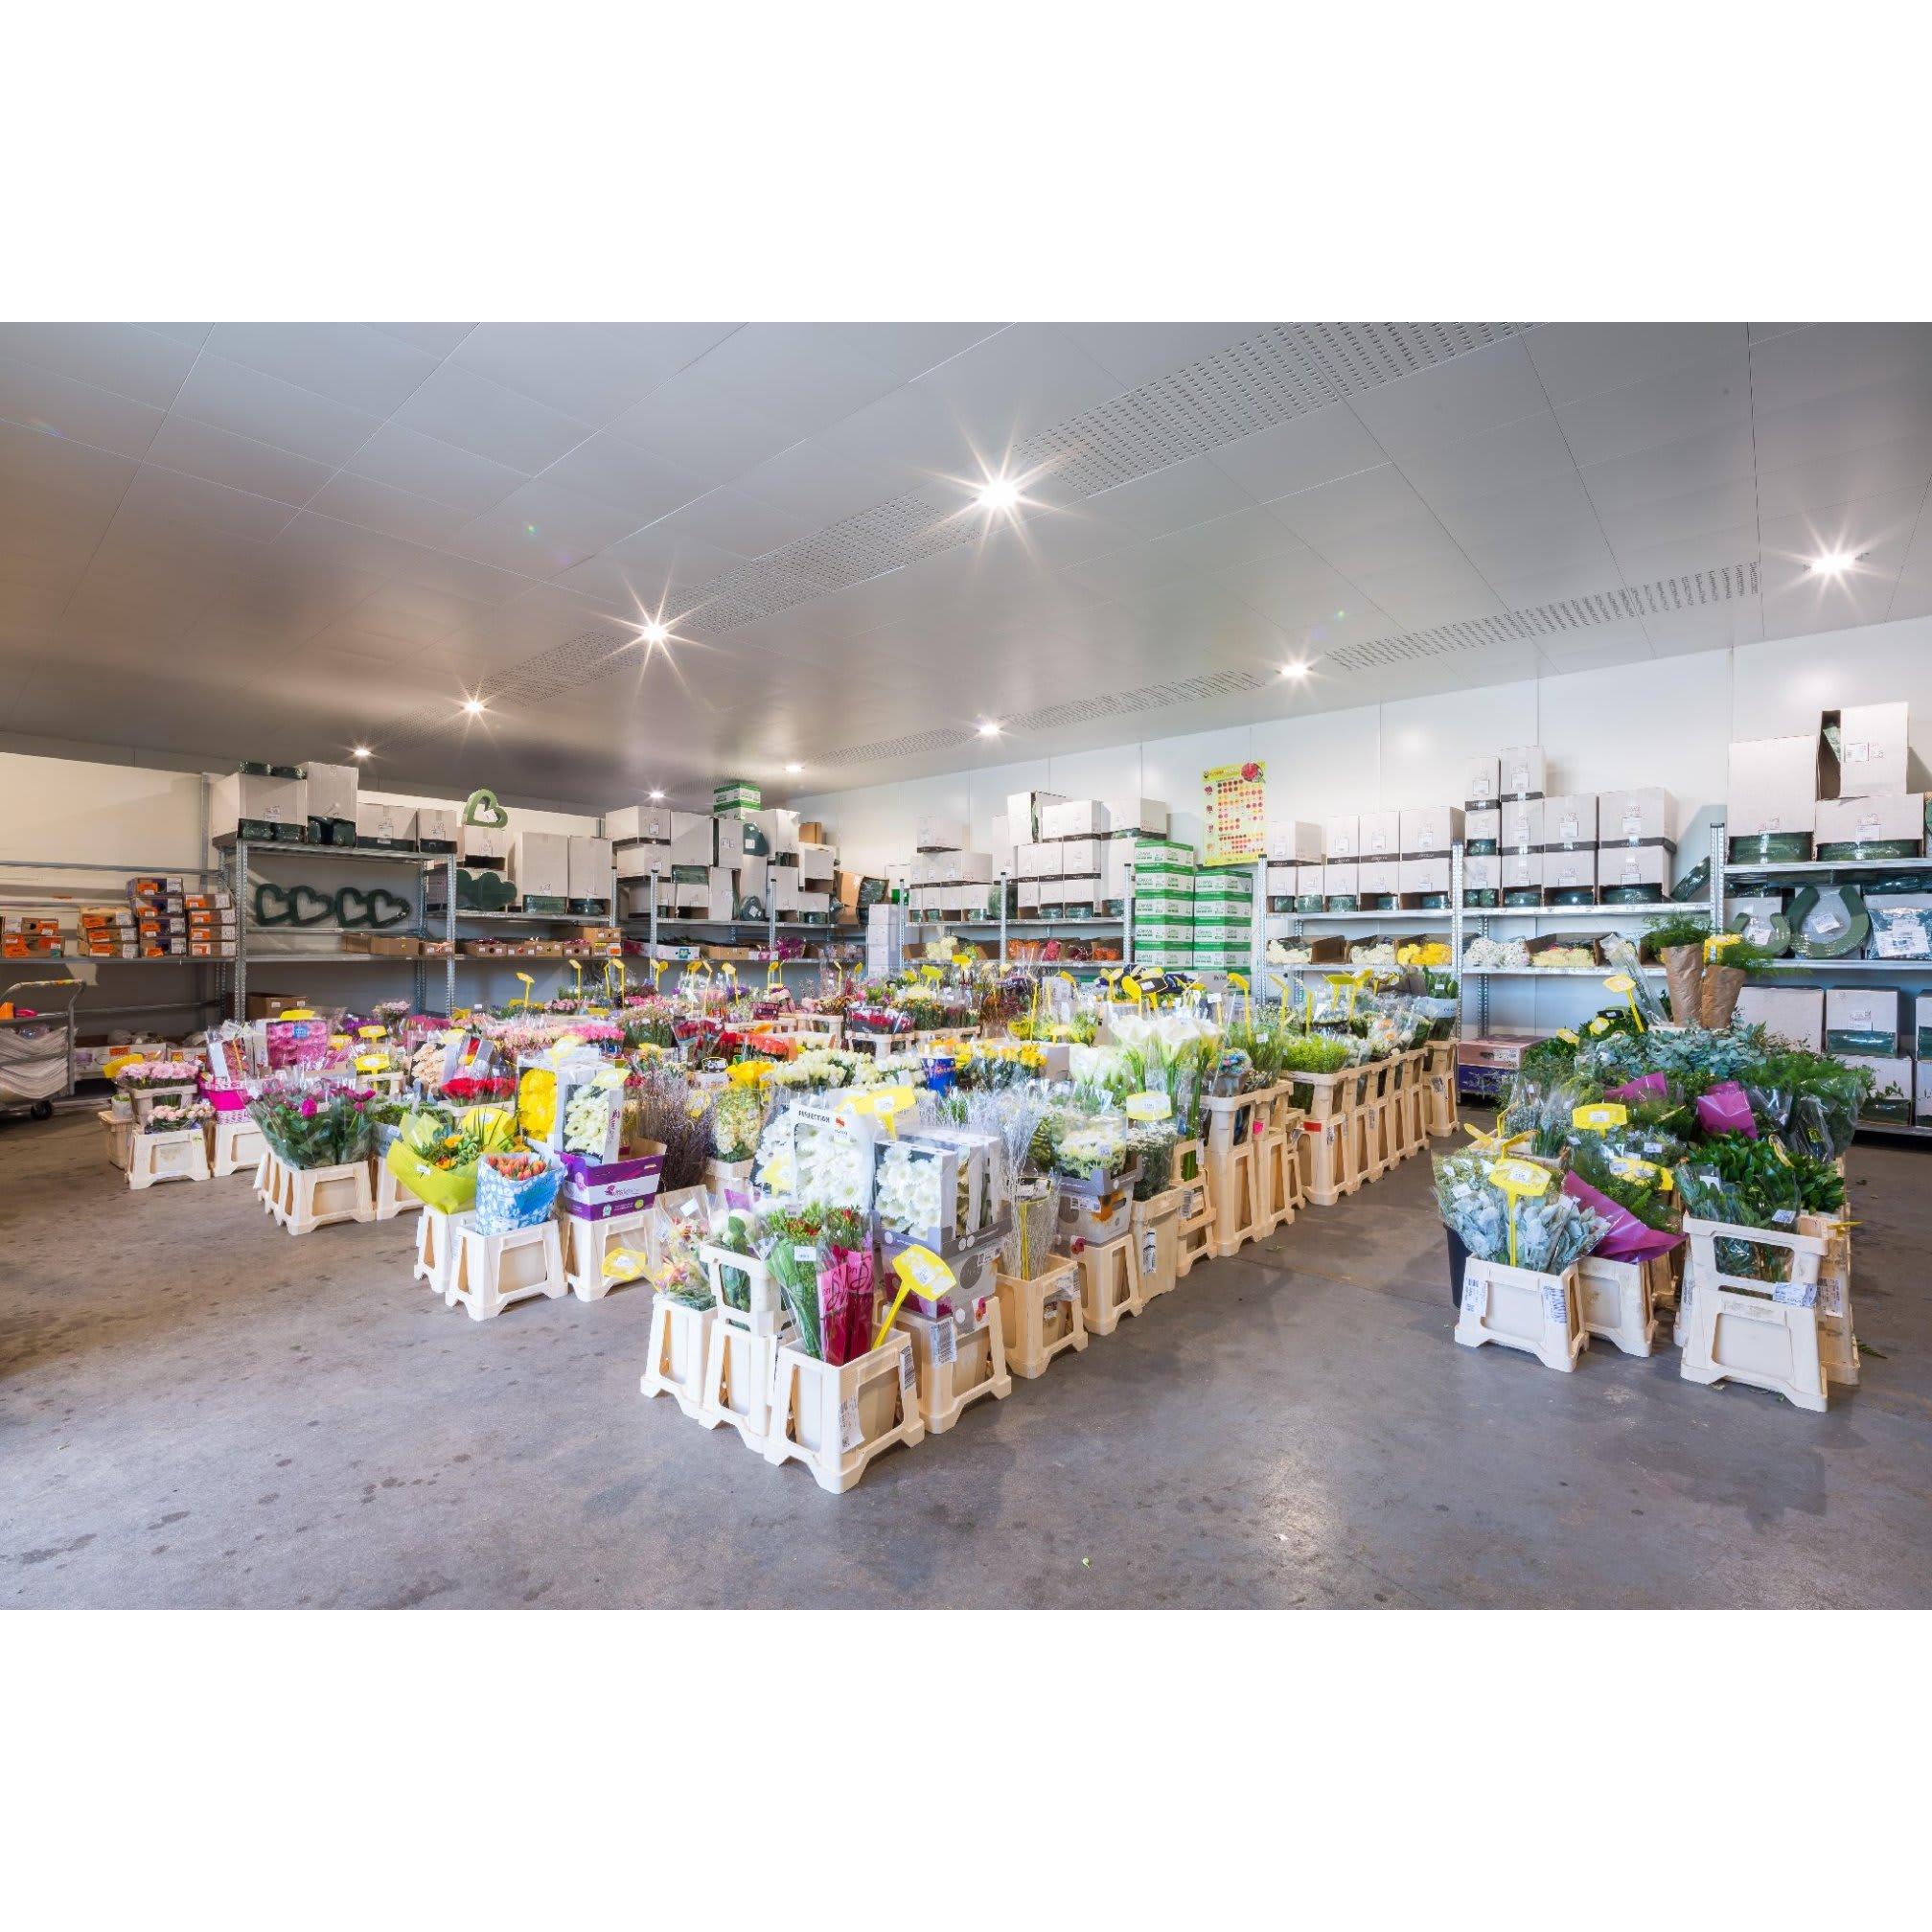 Sunflower Cash & Carry Ltd